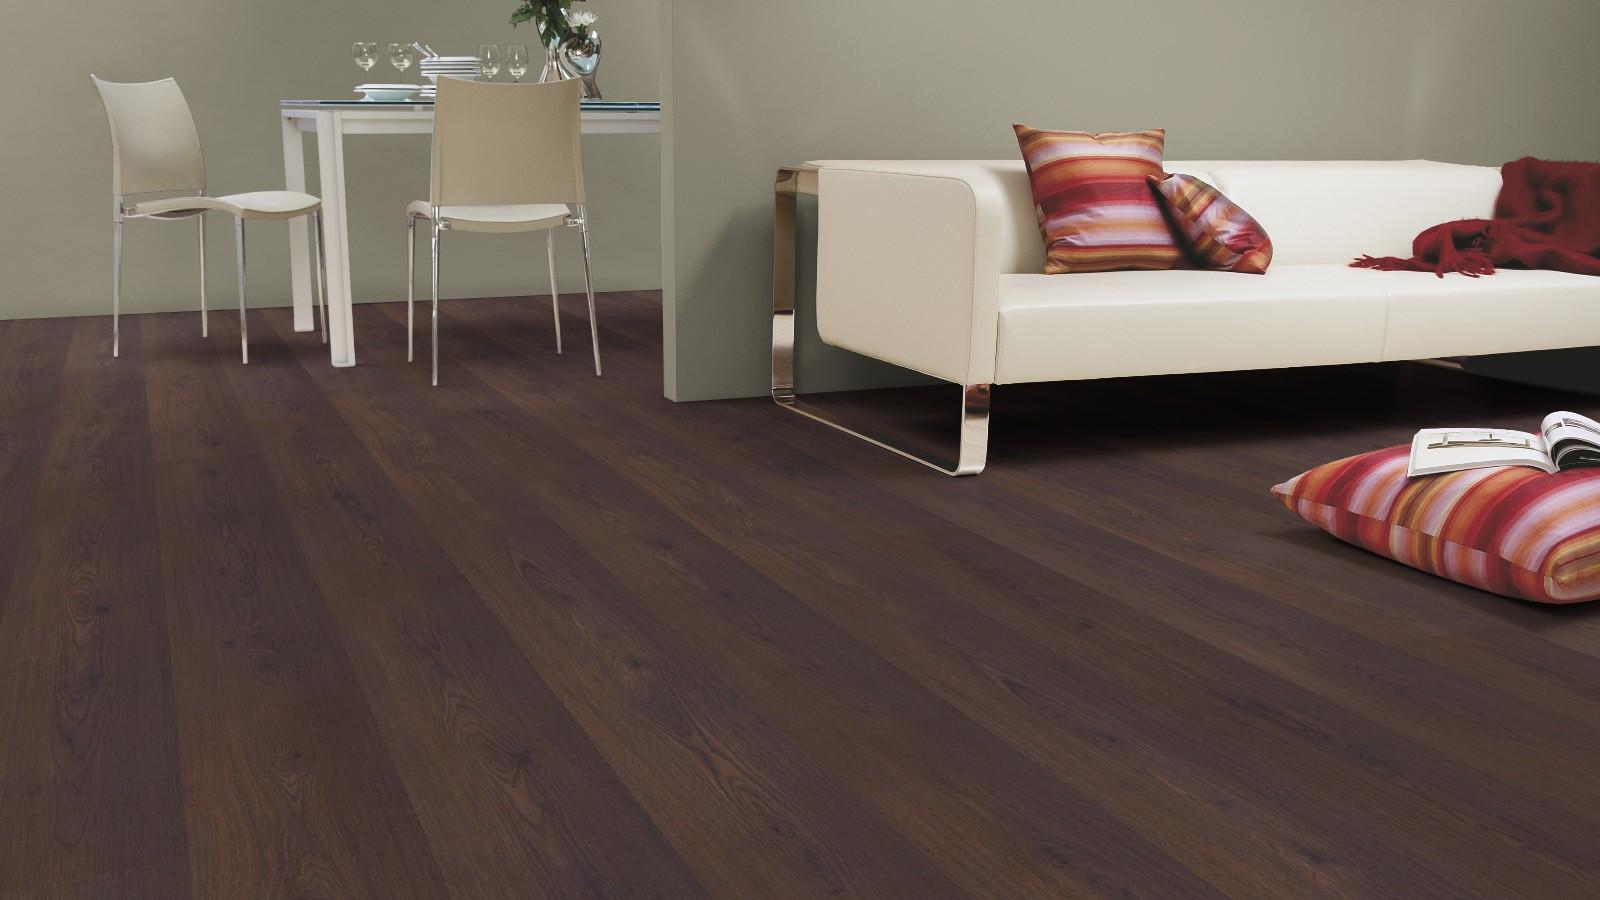 Kaindl Toscano 7 1 2 X 54 1 4 Oak Martone Flooring Hq Store